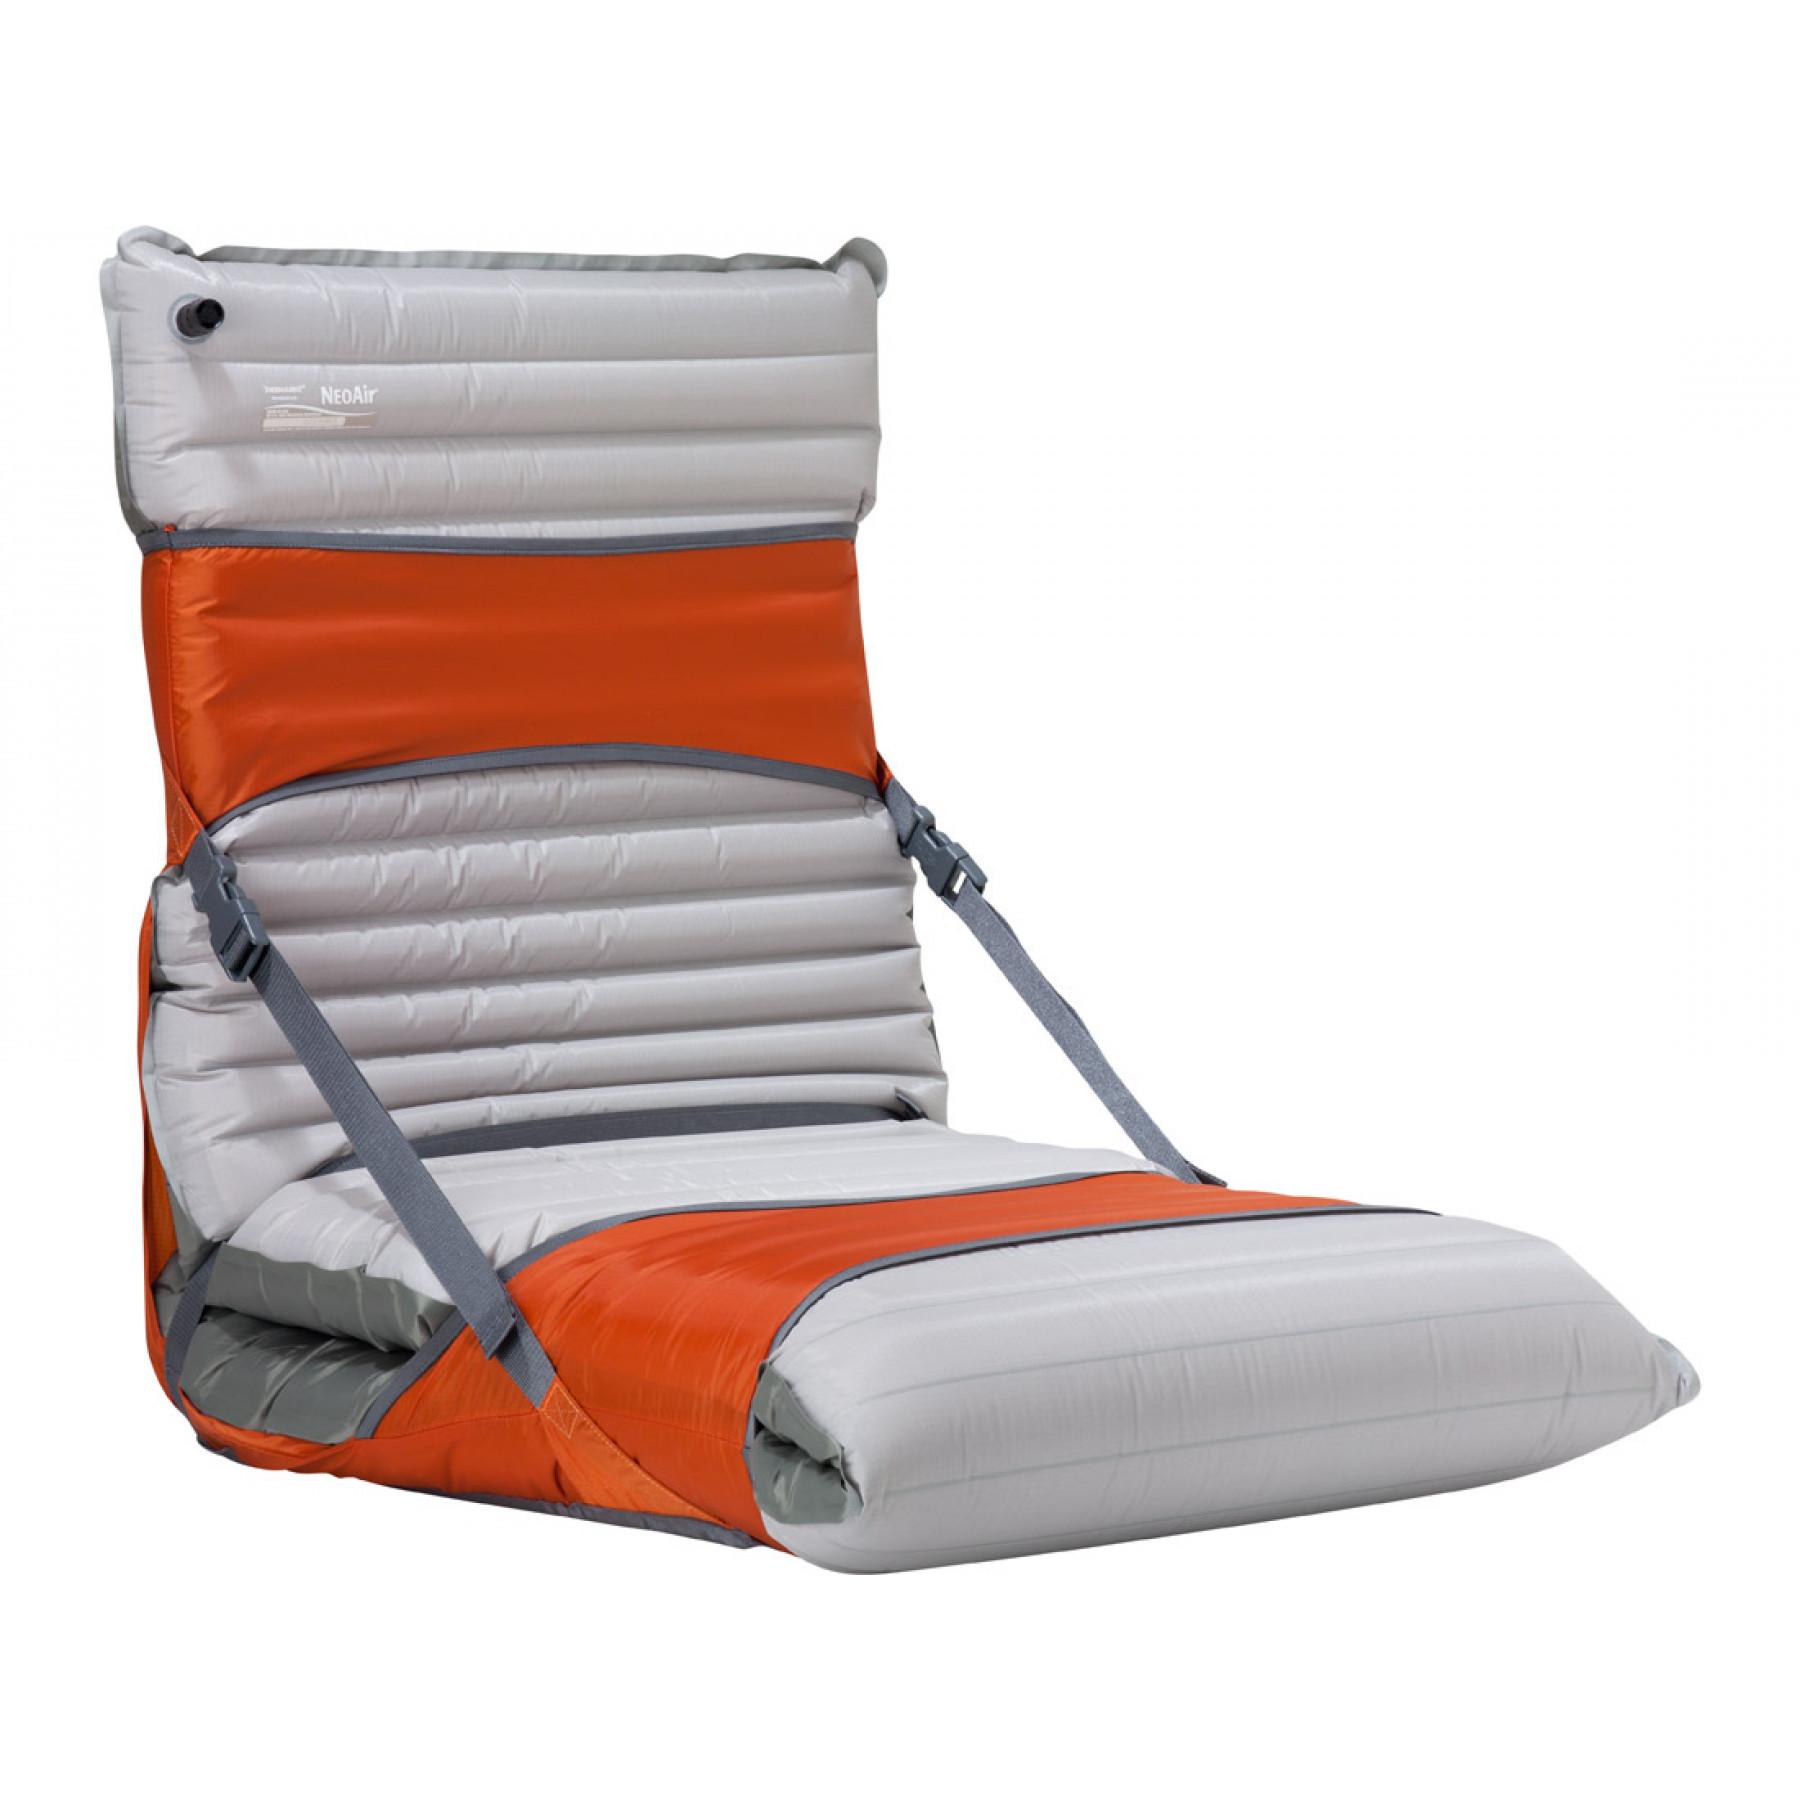 Sea to Summit Air Chair Regular stoltrekk til liggeunderlag